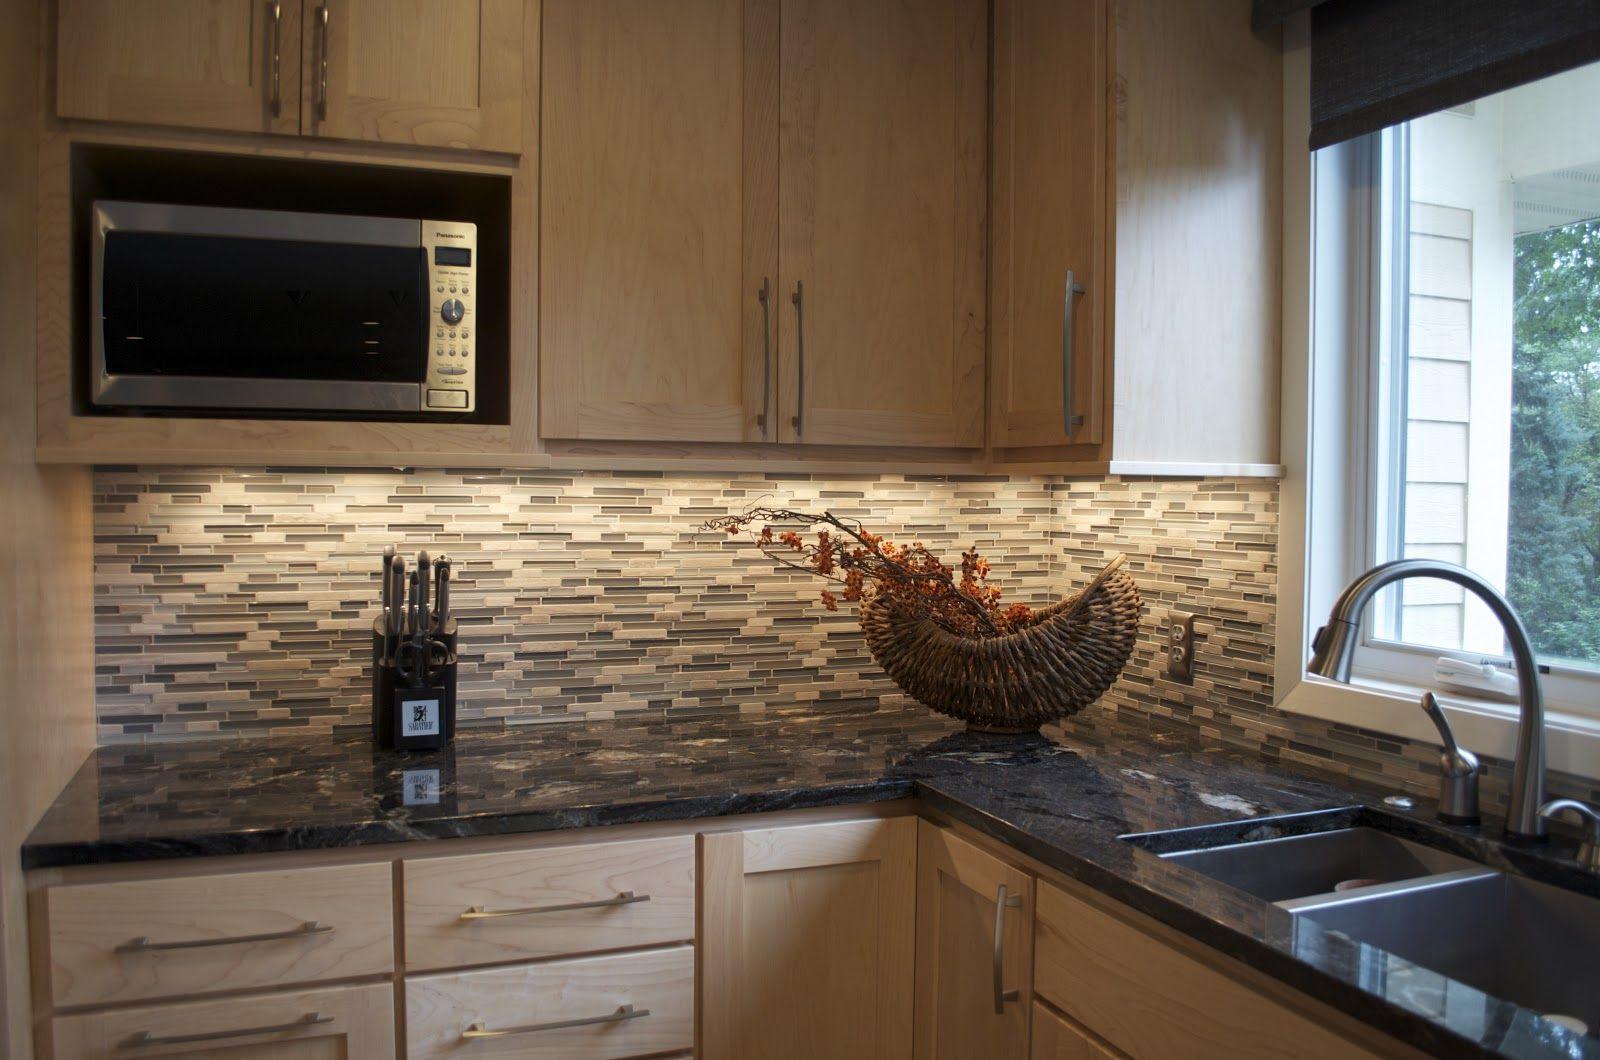 maple cabinet backsplash - Google Search | Modern kitchen ... on Backsplash For Maple Cabinets And Black Granite  id=61578